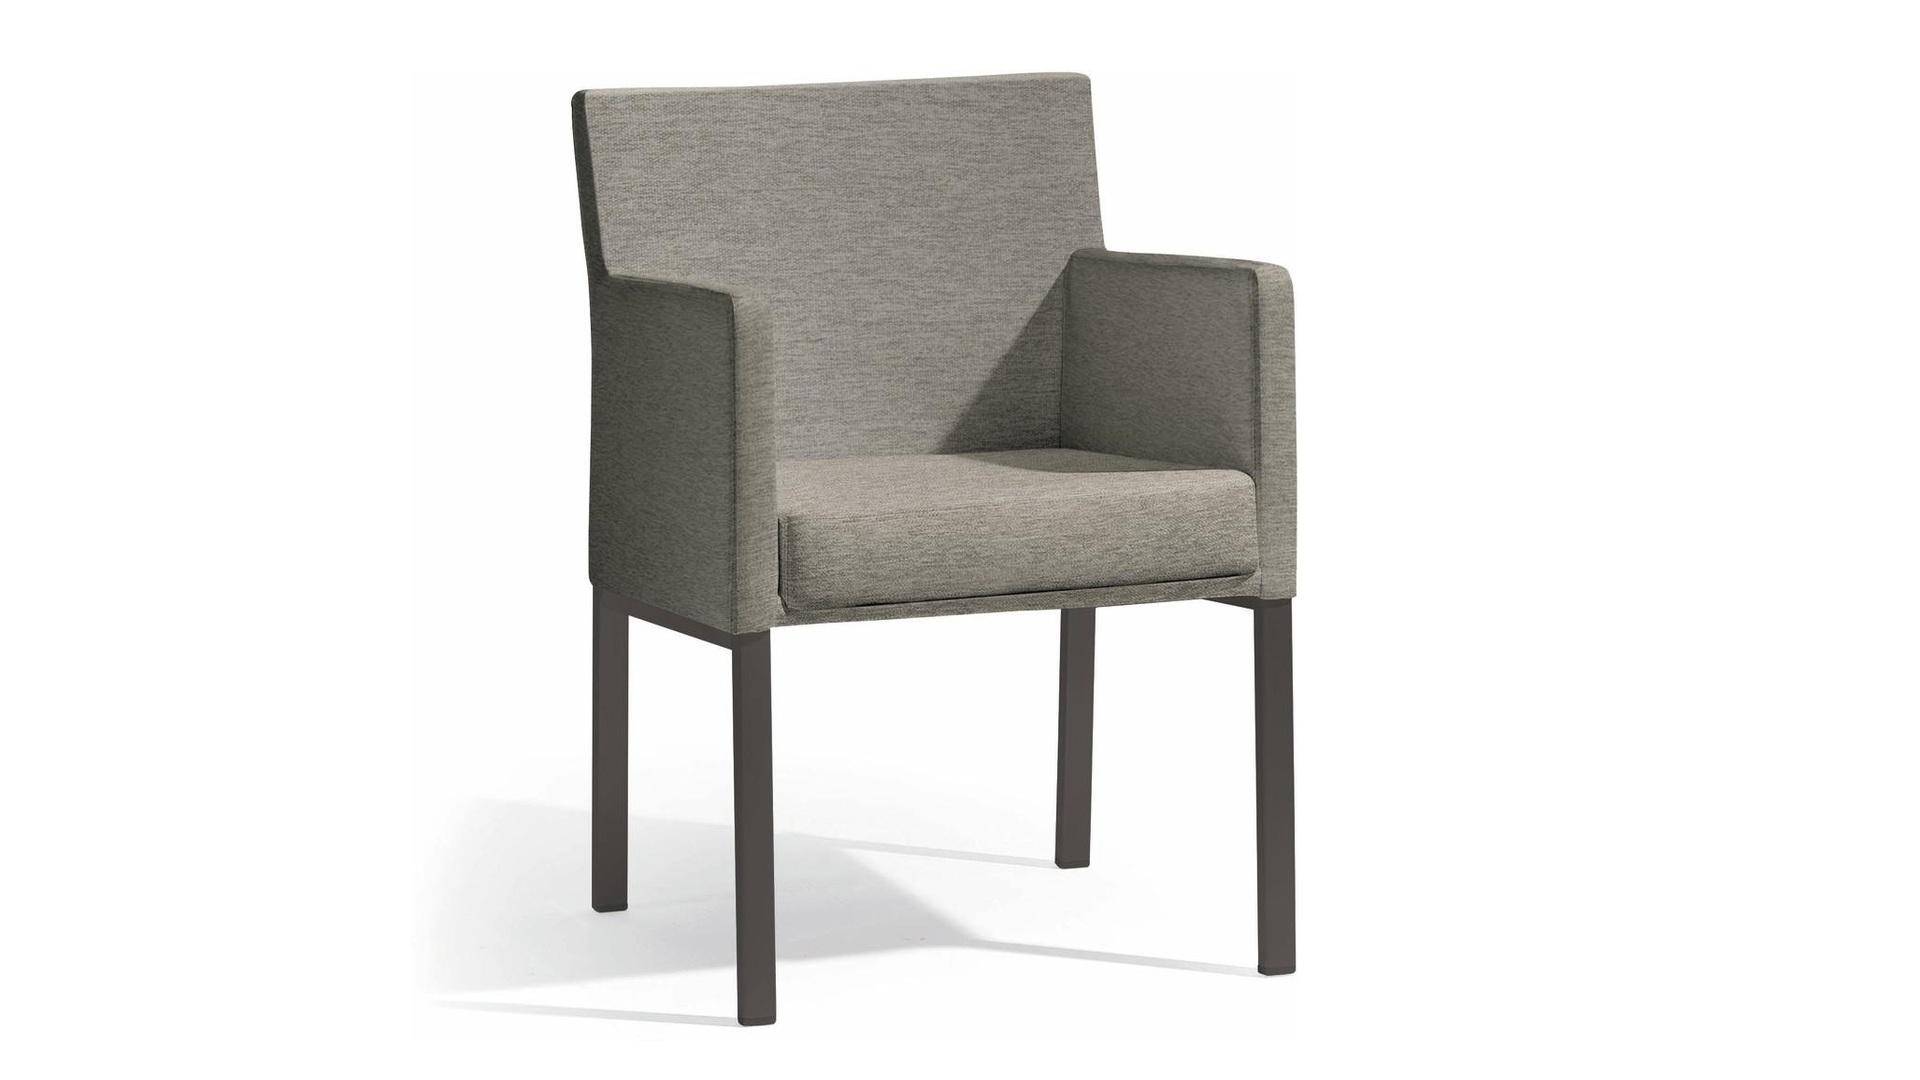 Liner armchair1.jpg